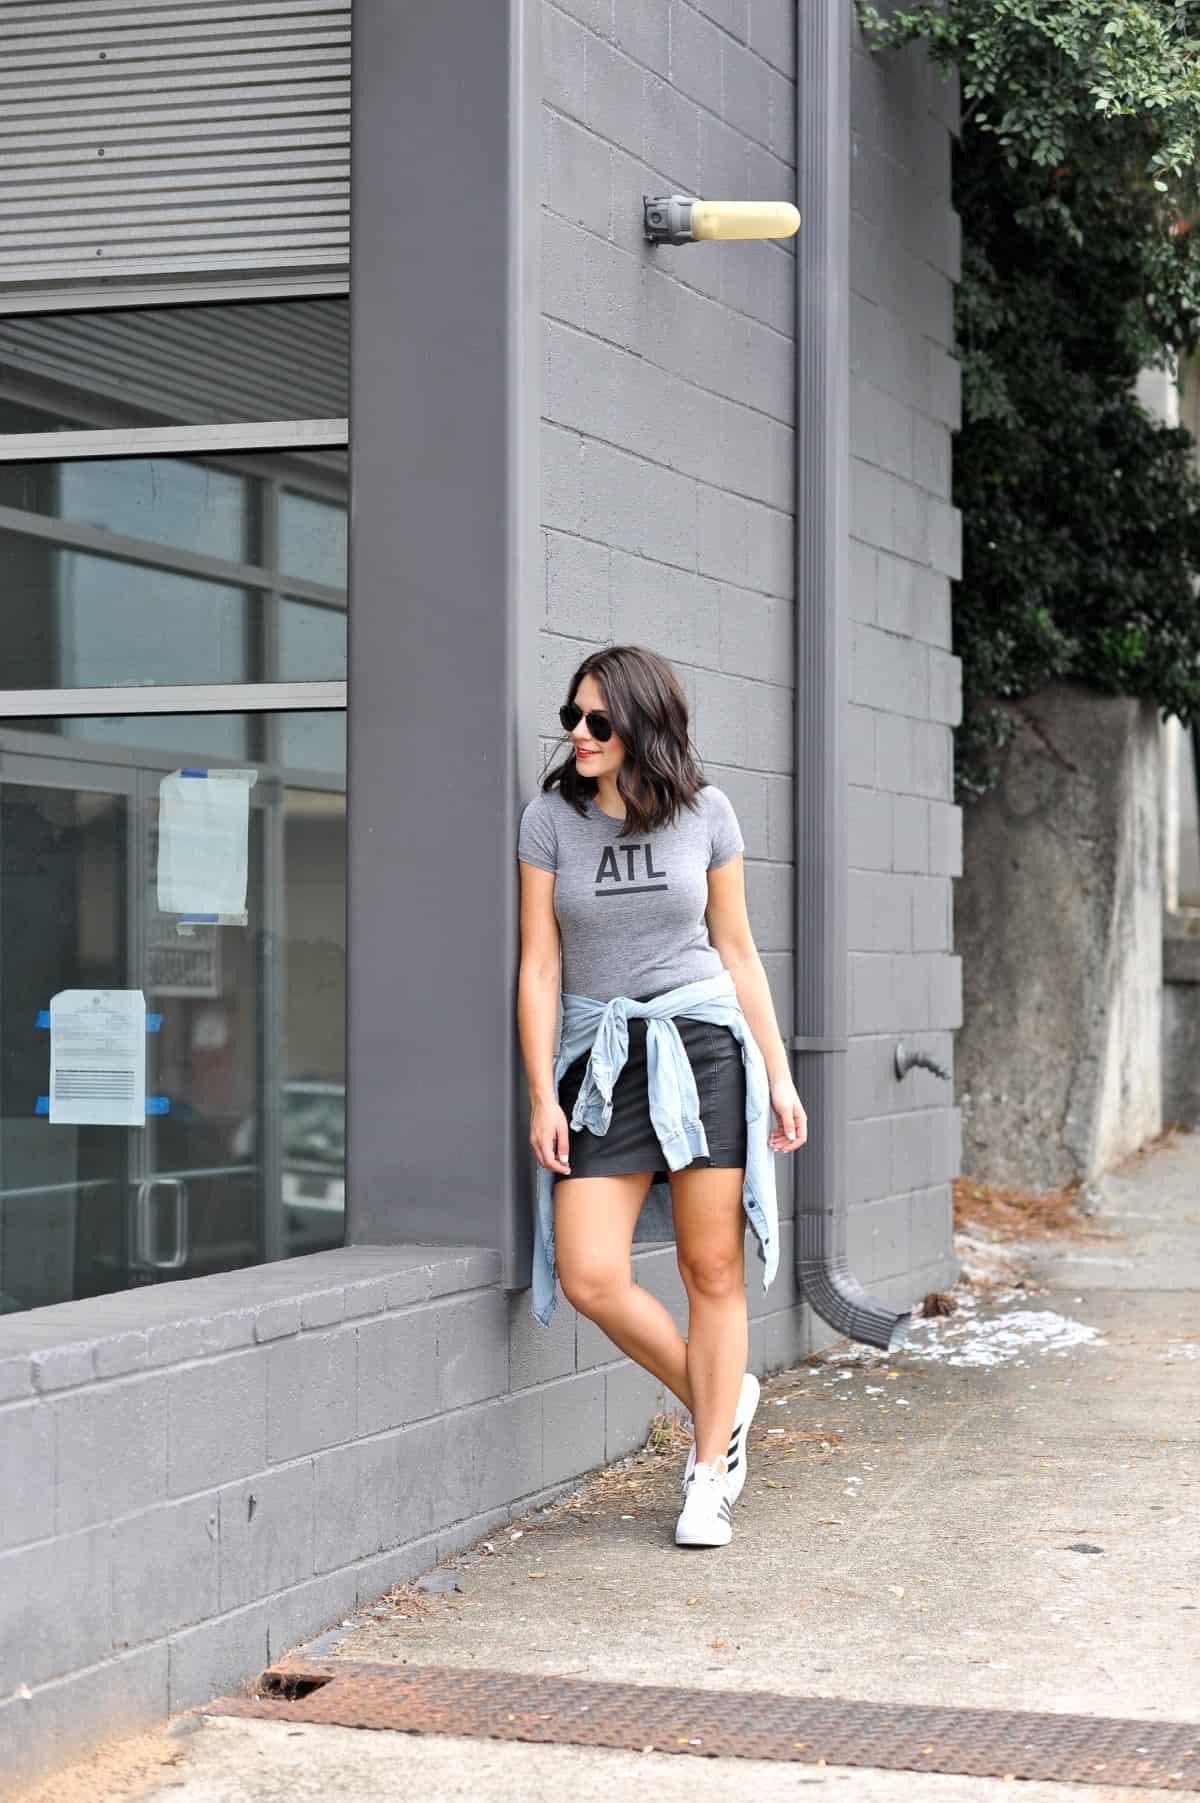 best atlanta based clothing brands, affordable outfit ideas, Adidas Superstars - My Style Vita - @mystylevita - 2